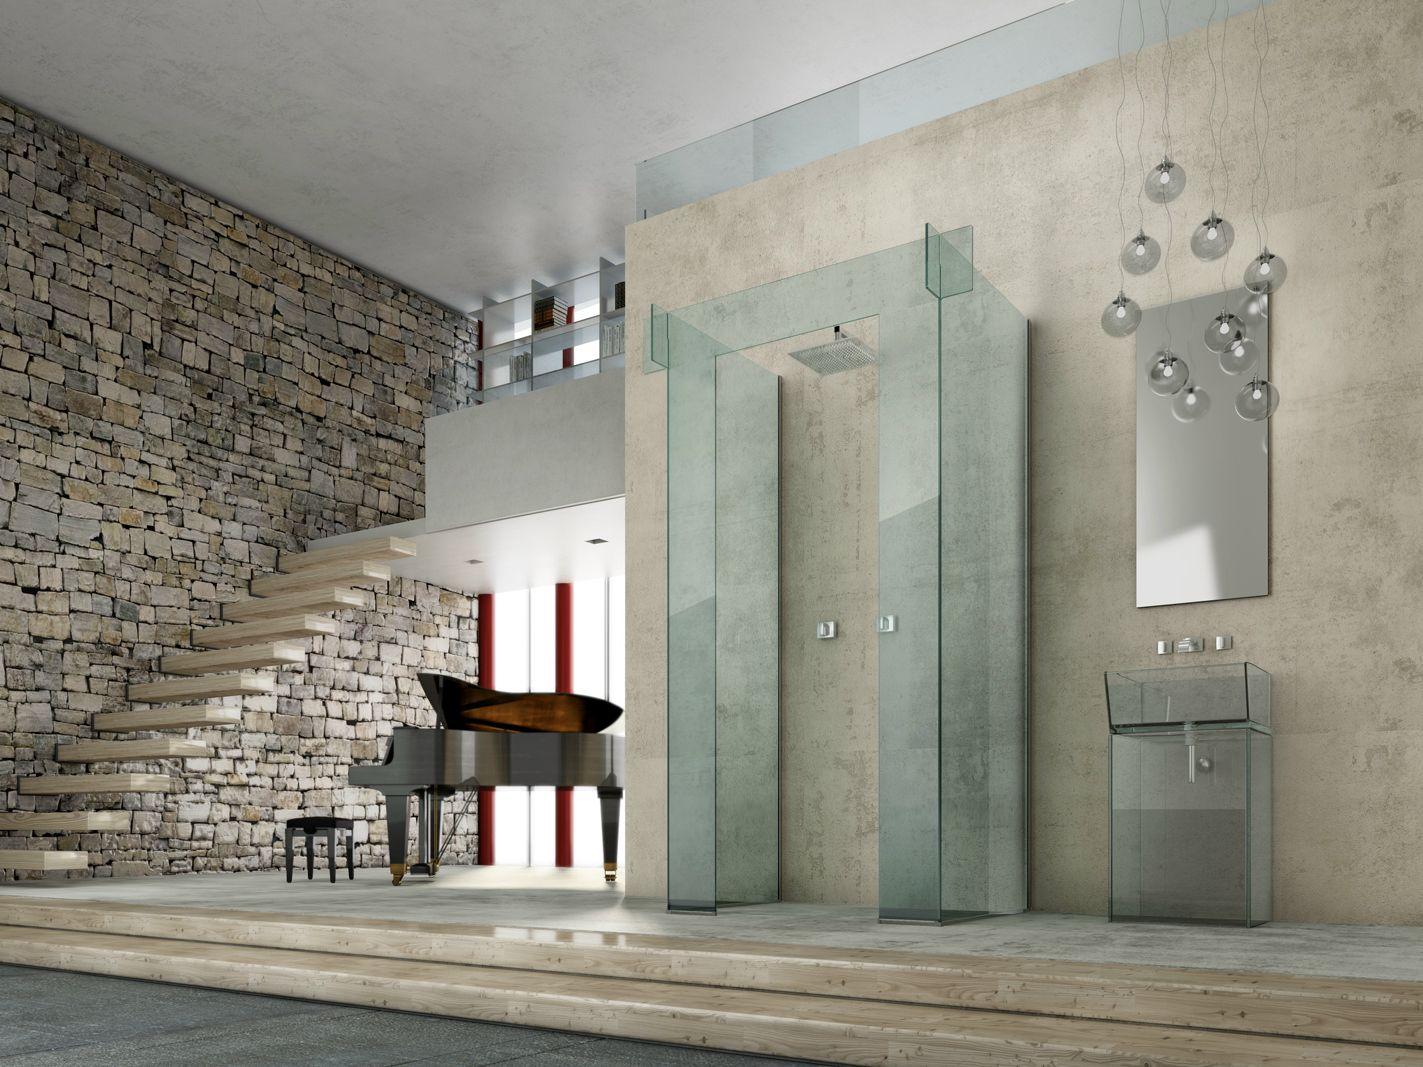 Box doccia in vetro icona separ parete by megius - Box doccia in vetro prezzi ...